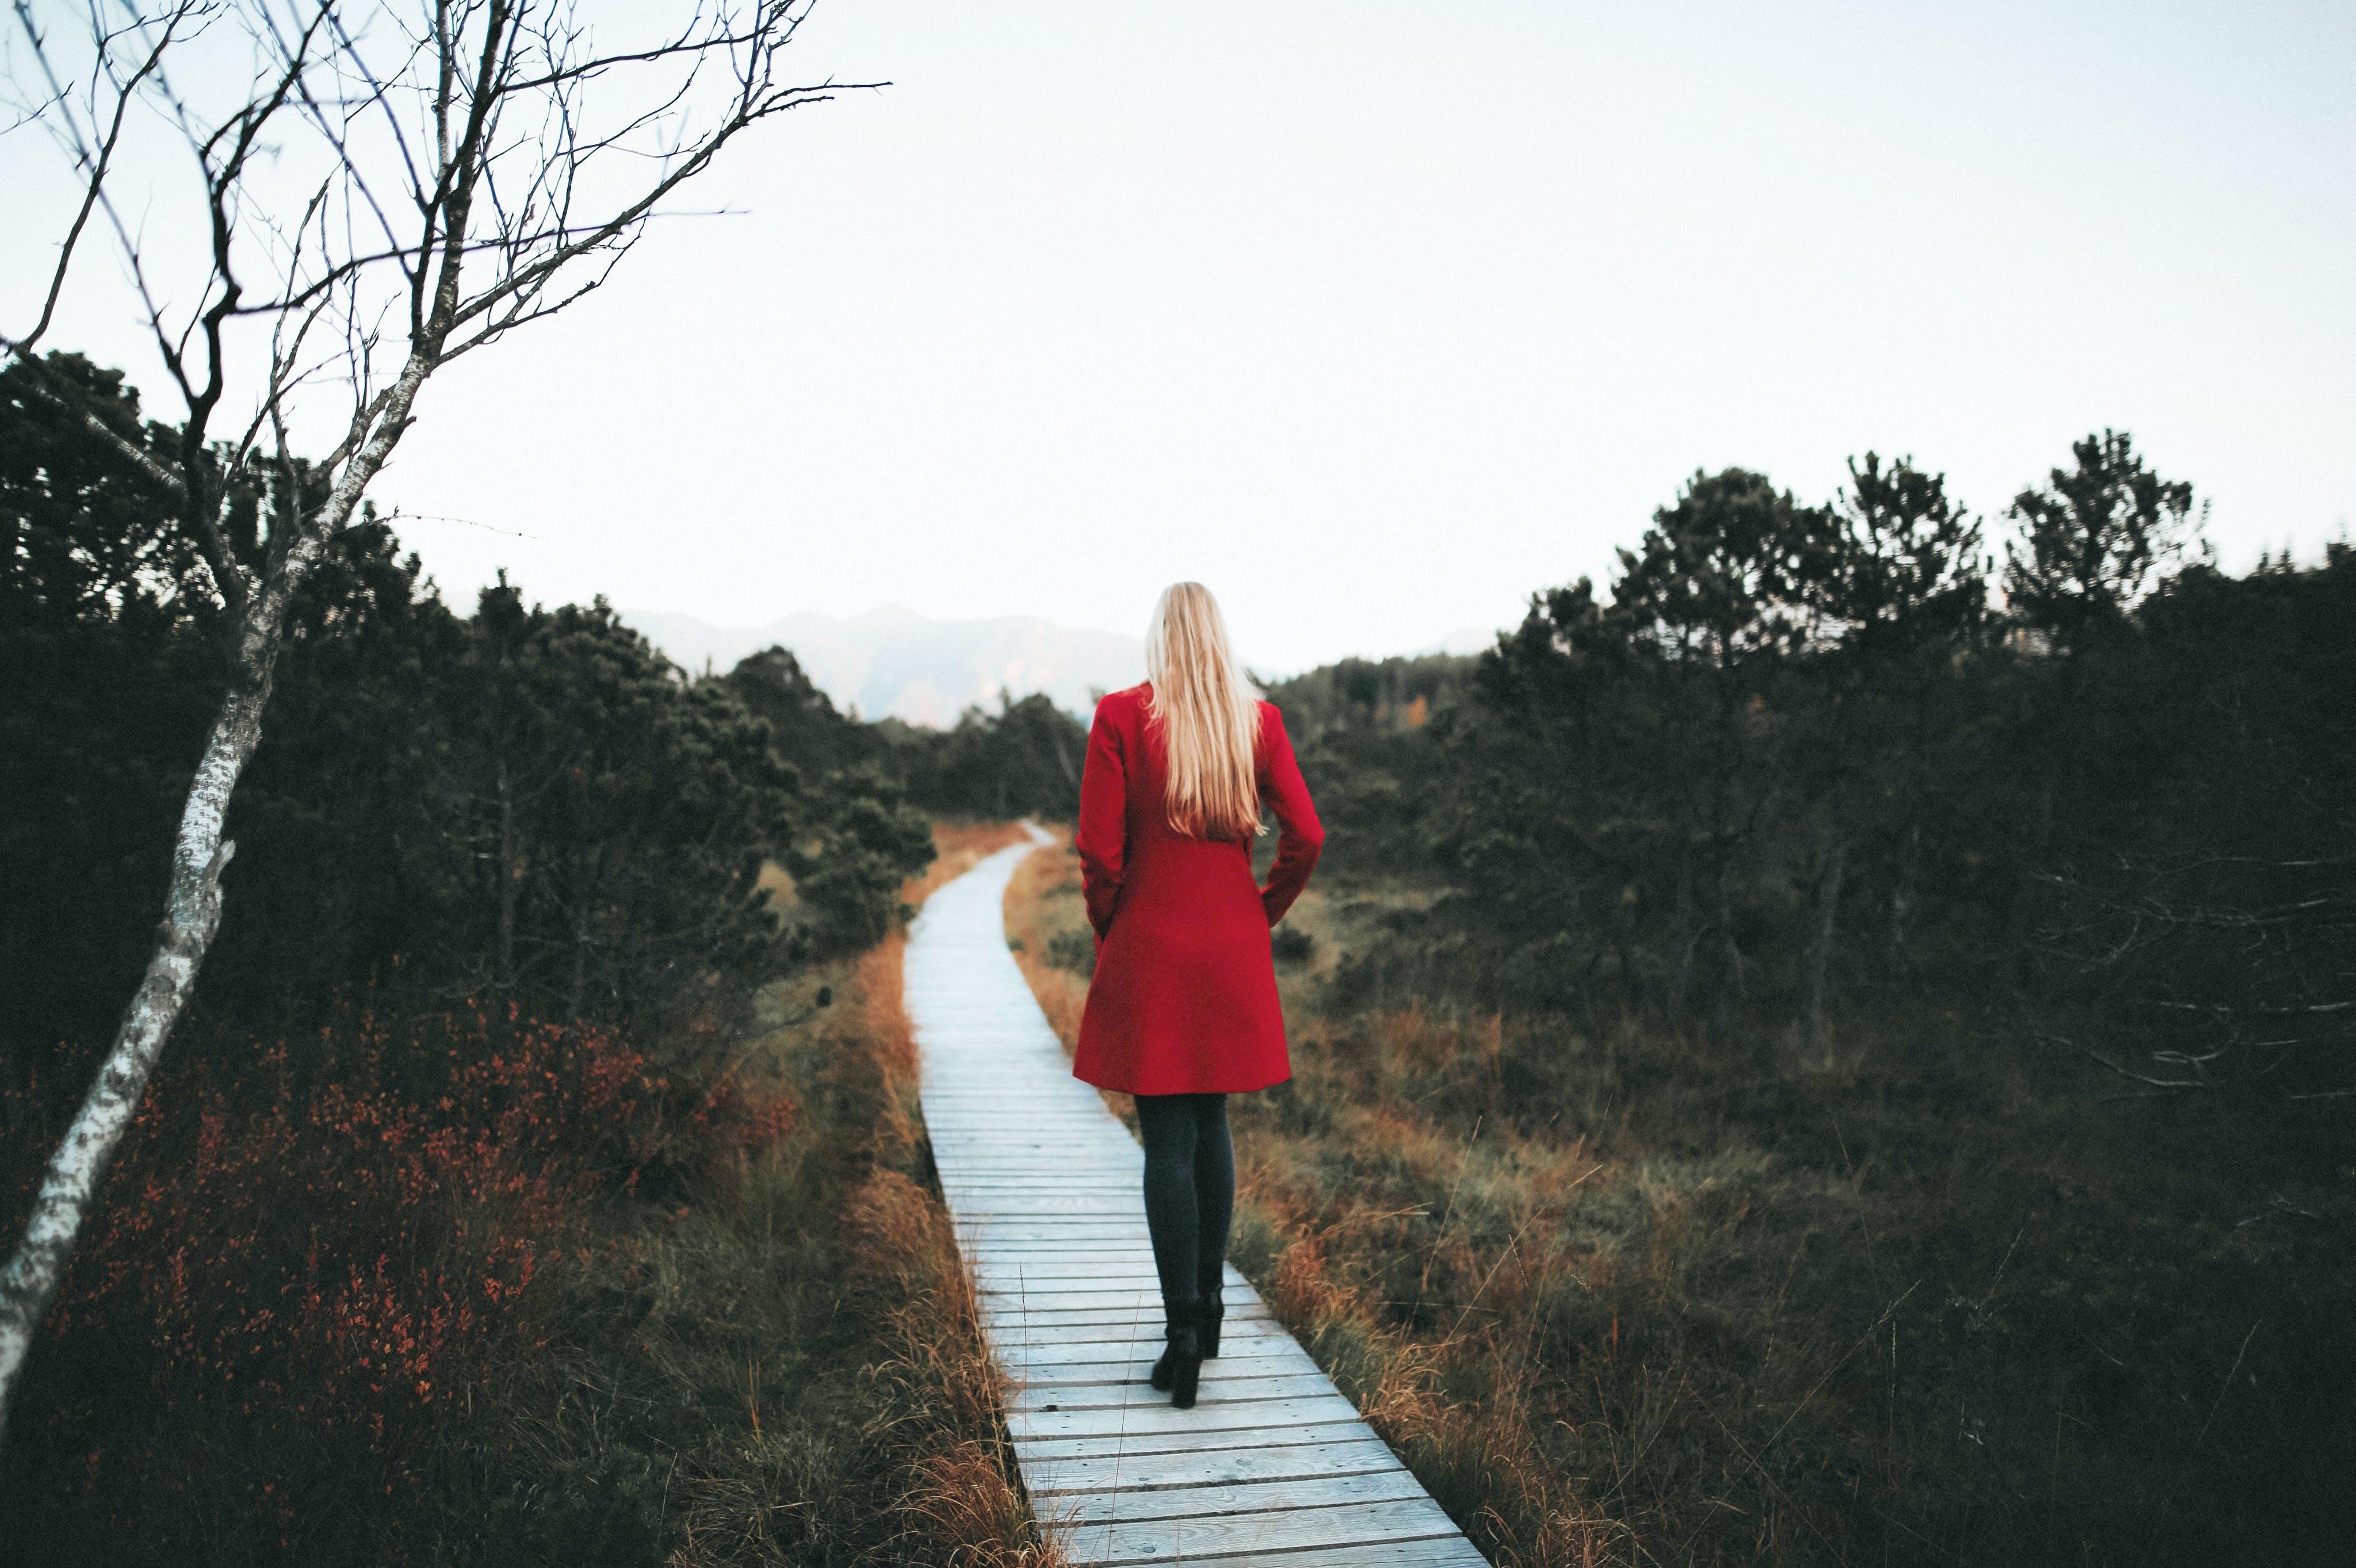 Woman Walking on Wooden Pathway